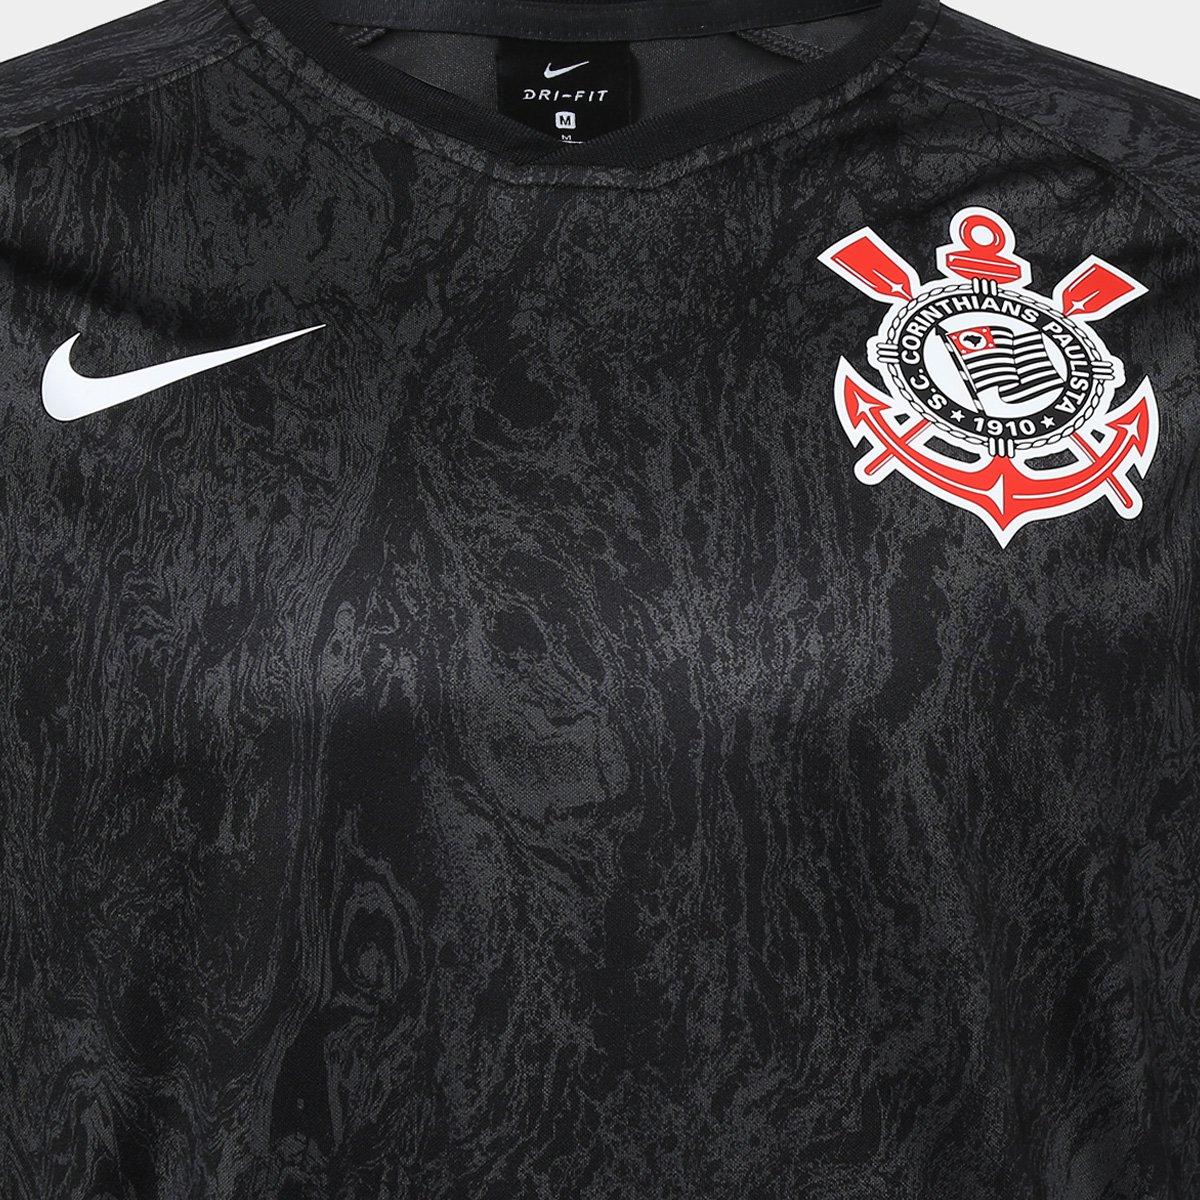 ... Camisa Corinthians II 2018 s n° - Torcedor Estádio Nike Masculina ... 35b8c7e6ec1c3